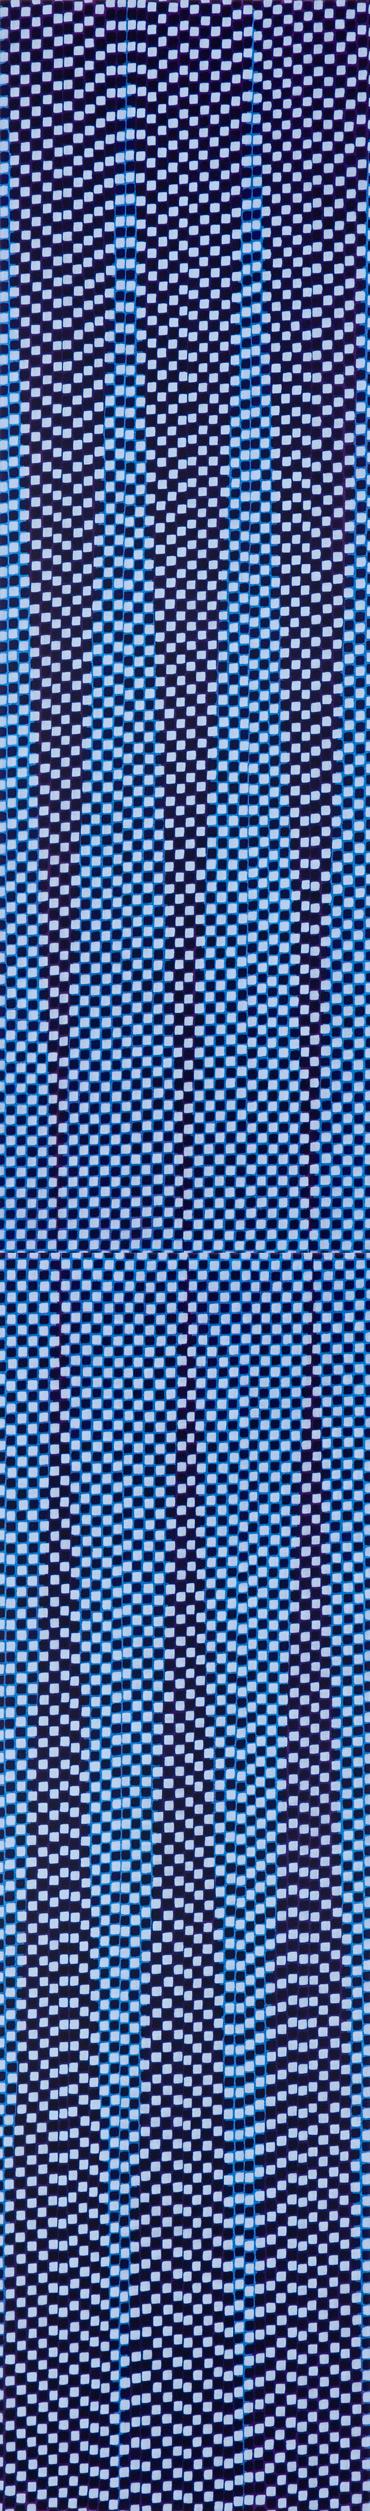 Water Column#1, oil paint, pigment, medium on linen,  200 x 30 cm, 2 panels